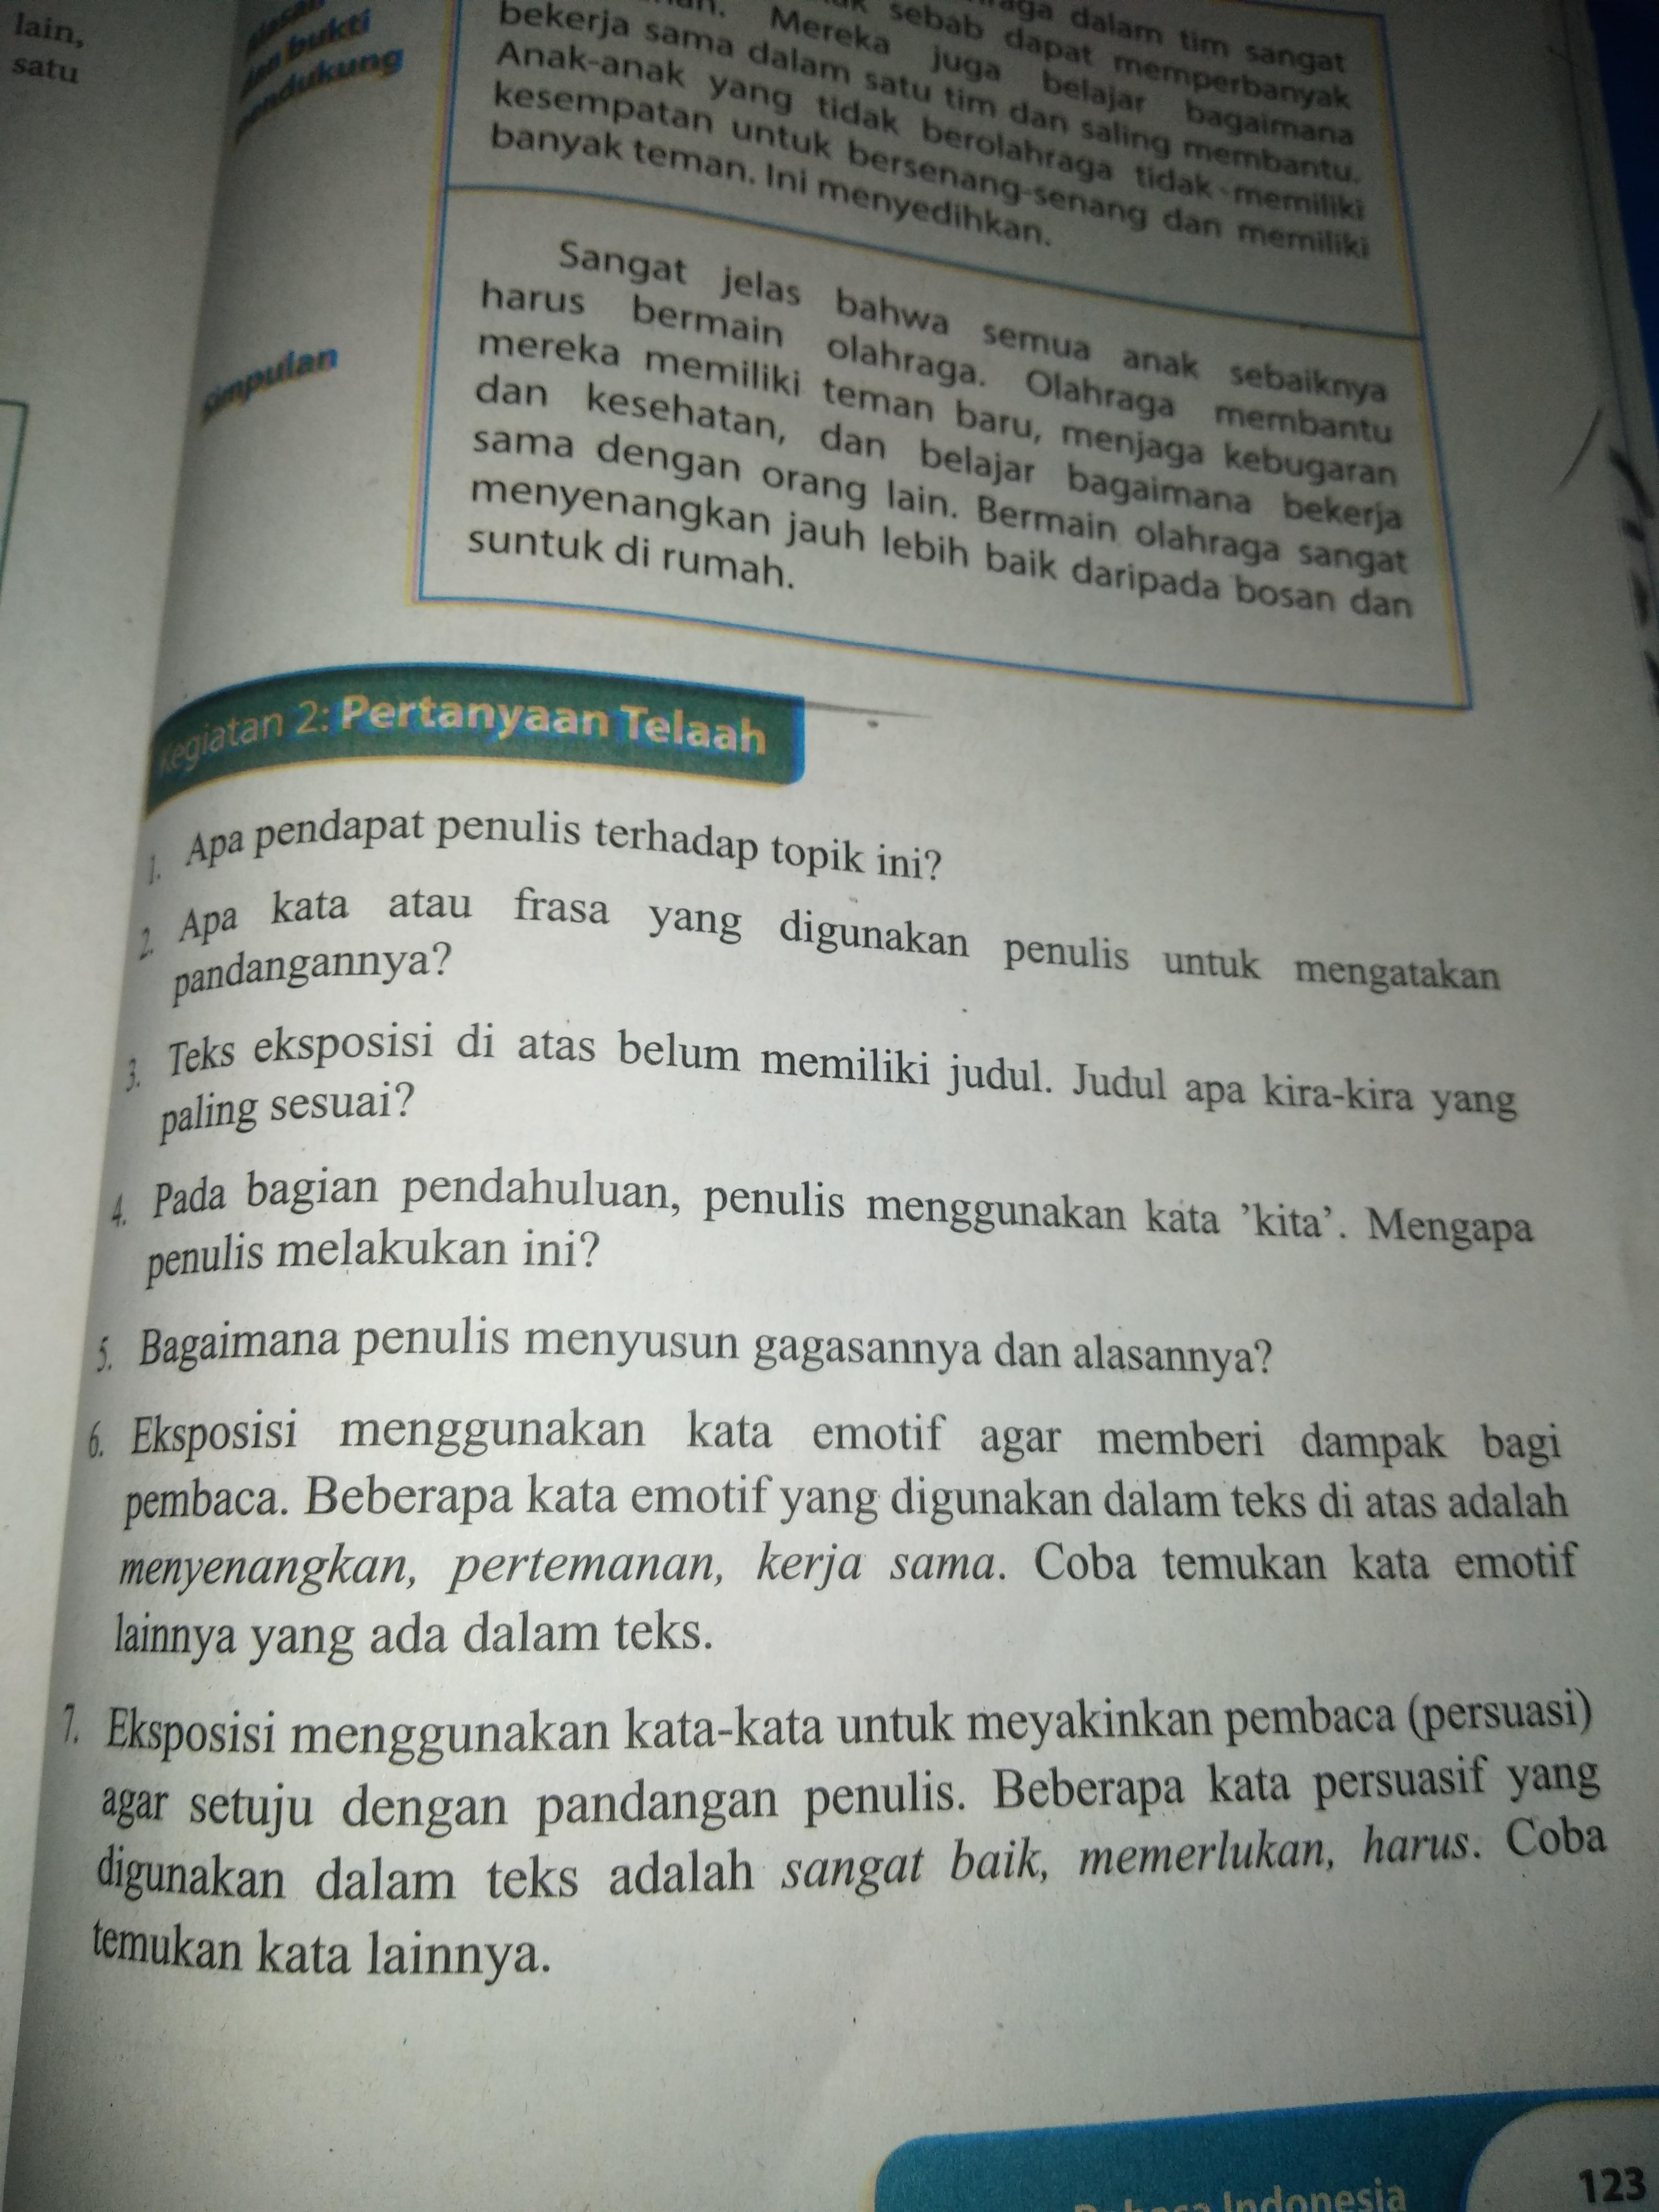 Buku Paket Halaman 123 Bahasa Indonesia Kelas 9 Ilmusosial Id